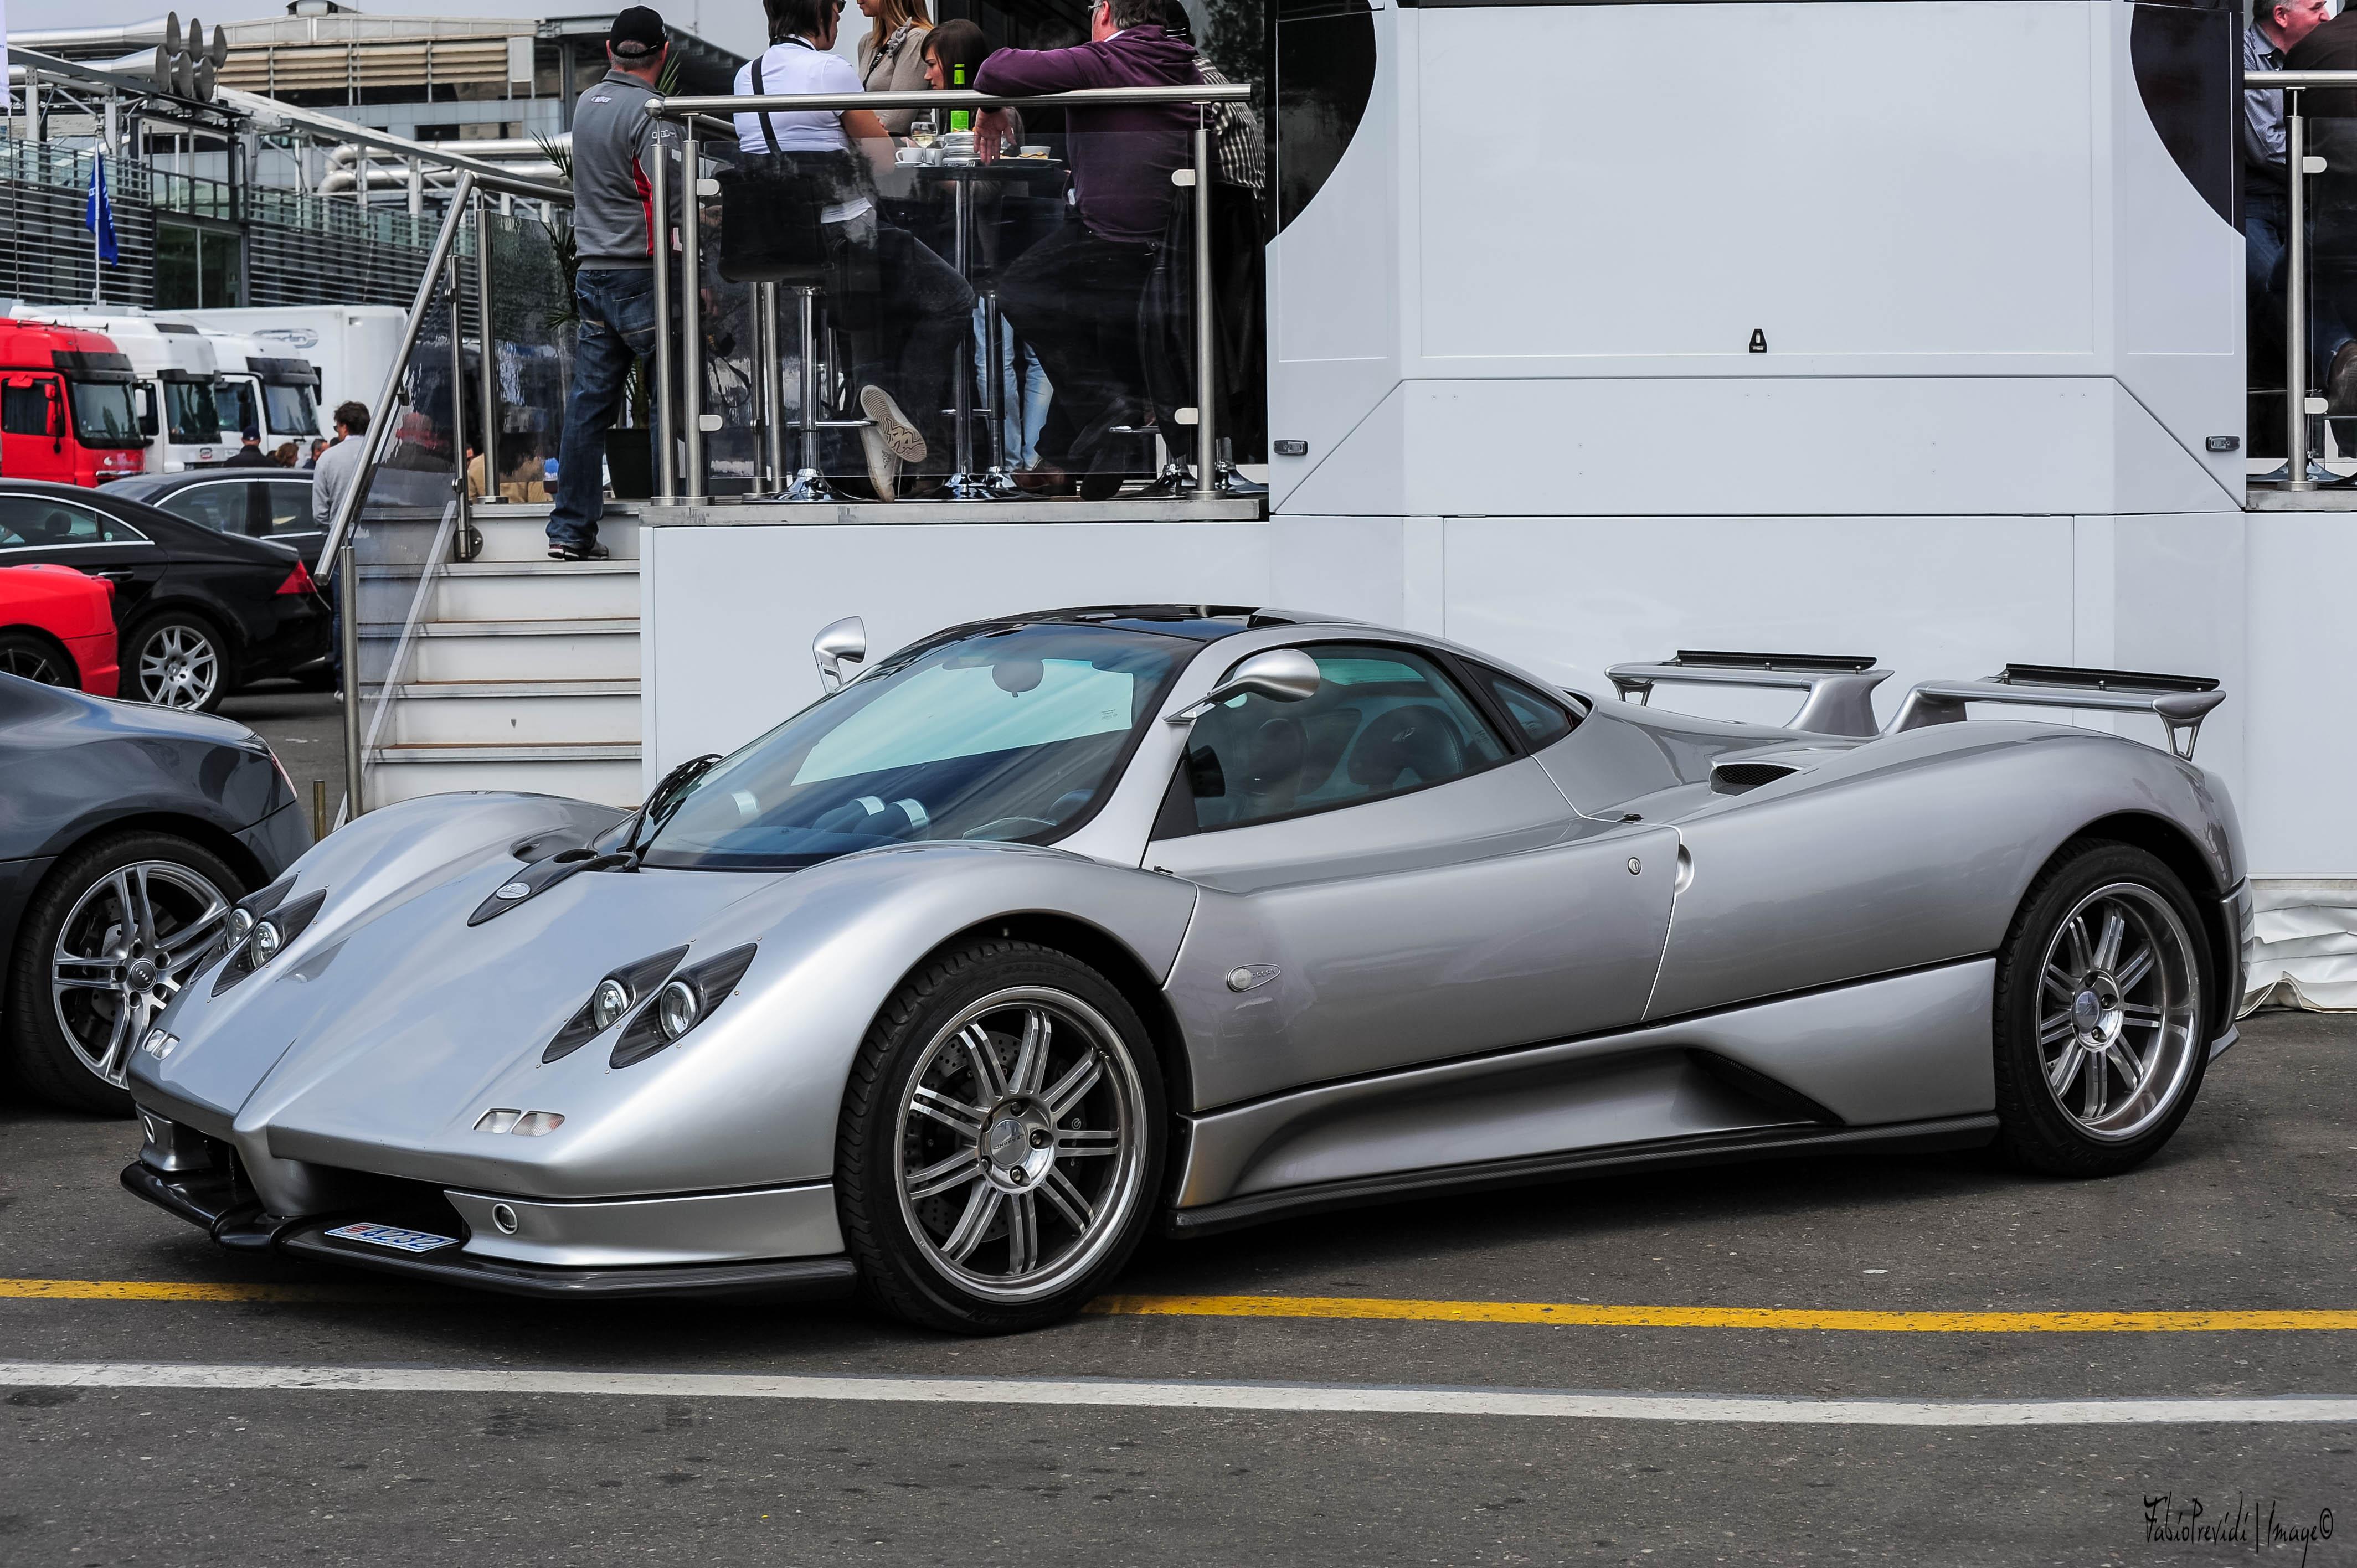 Pagani Zonda Supercar Hypercar Auto Super Cars Pagani Cars